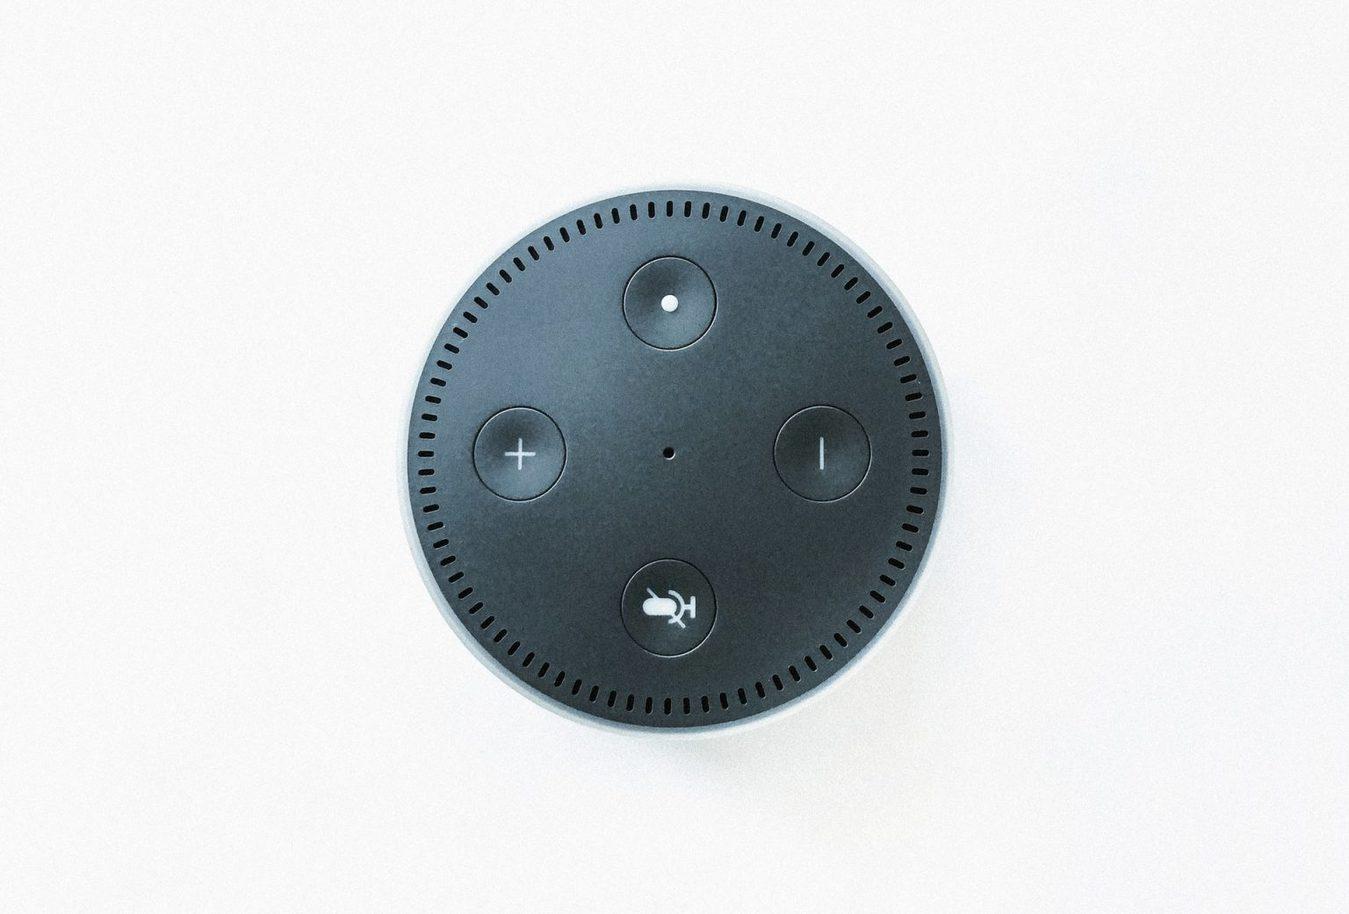 Alto-falante Amazon Echo visto de cima